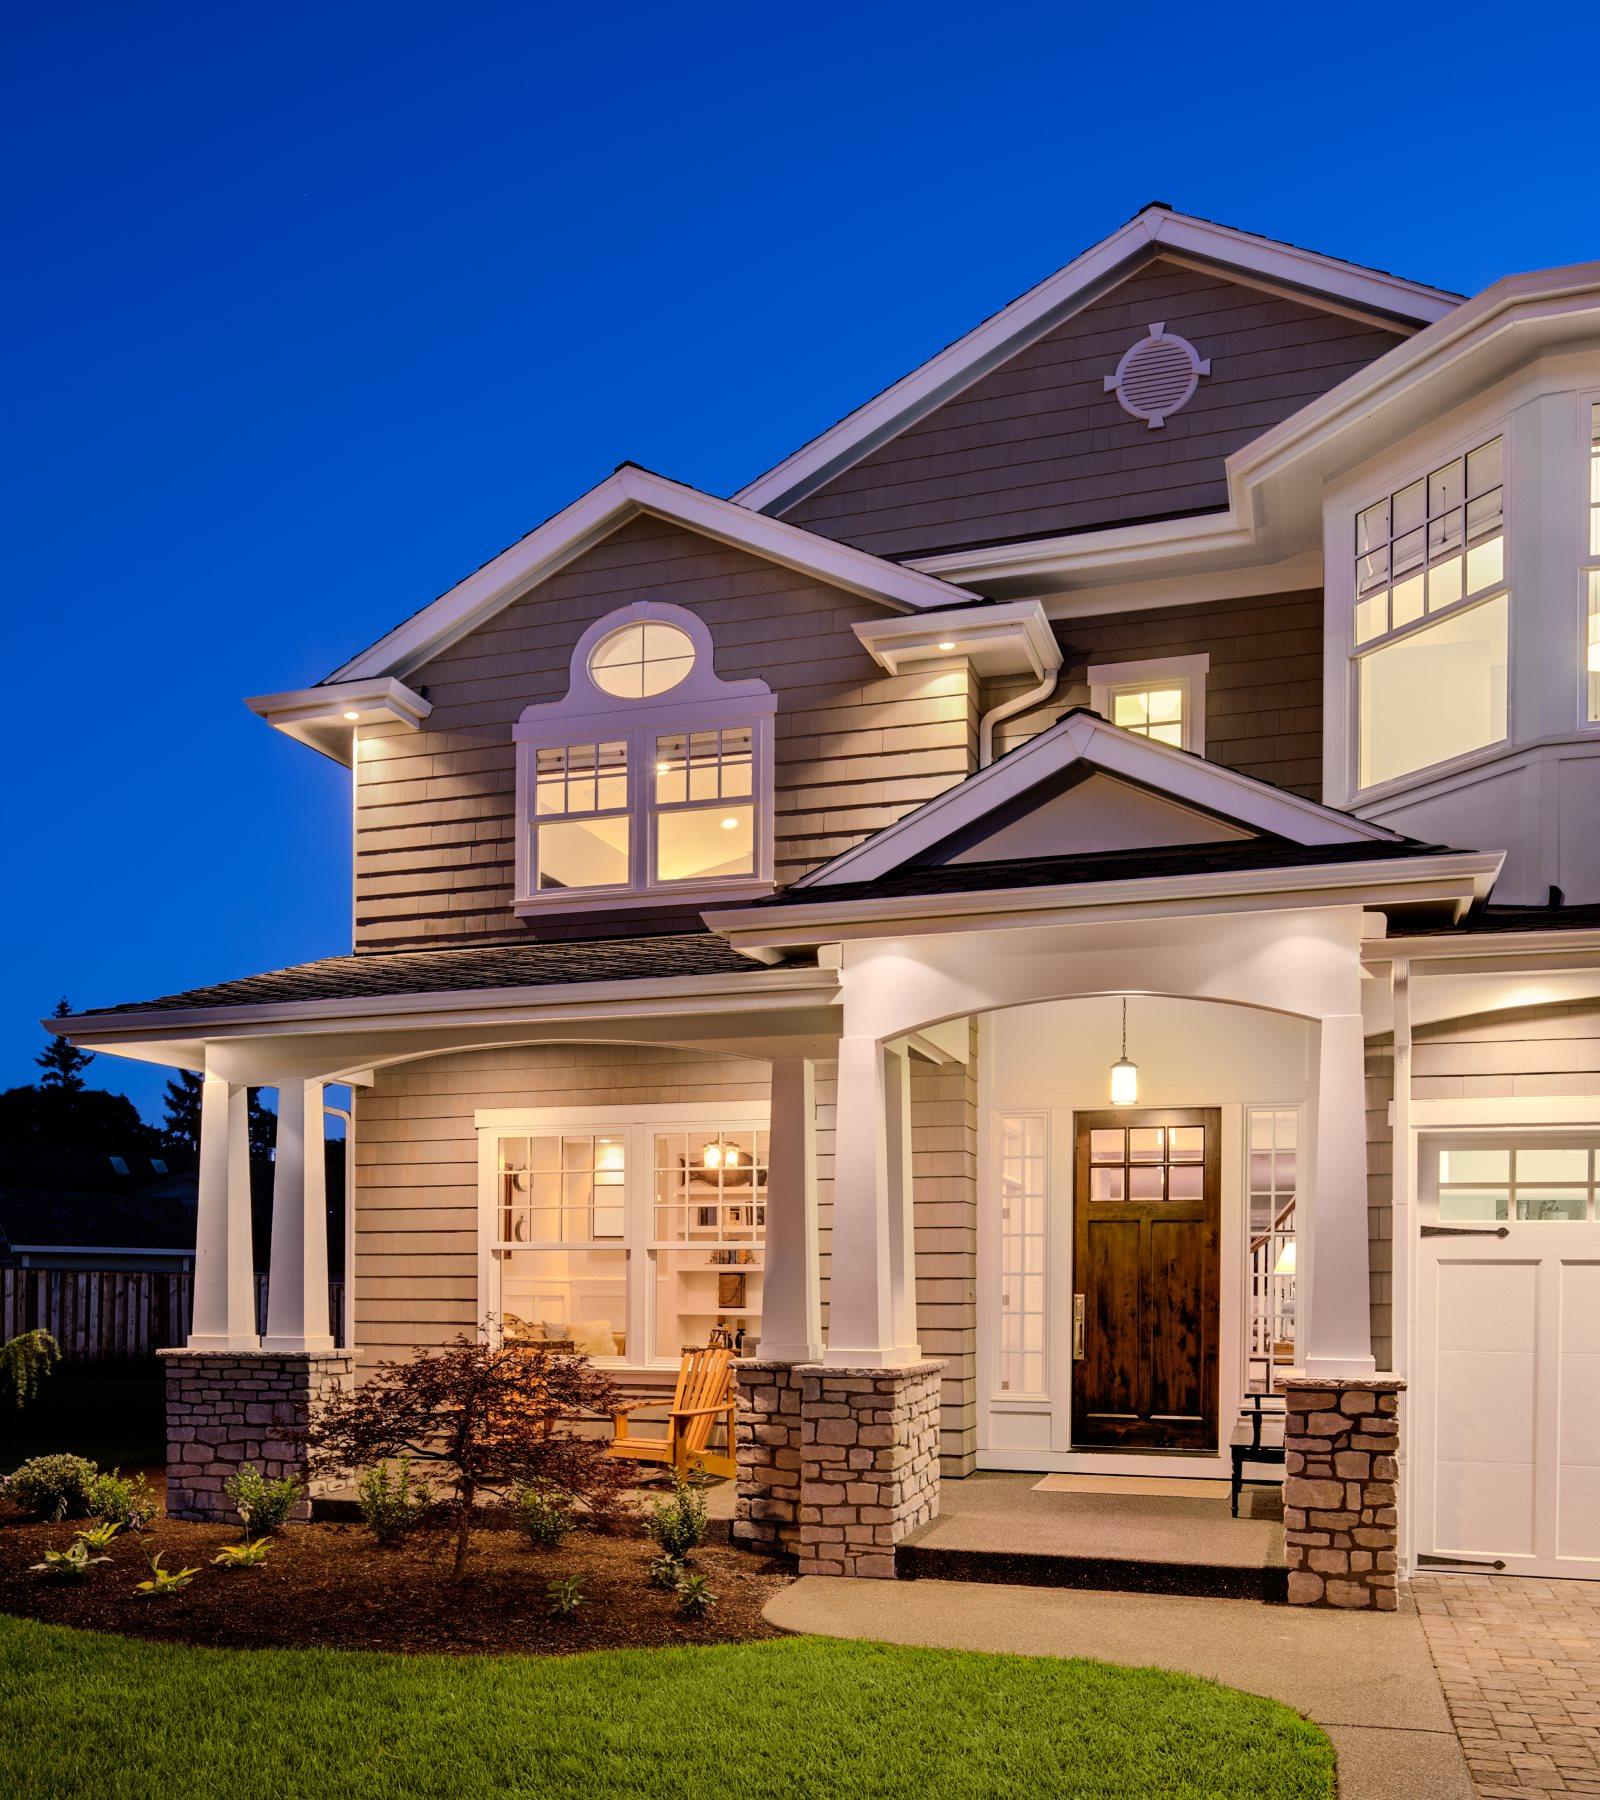 Custom Home Remodeling MA   High End Home Remodeling Massachusetts